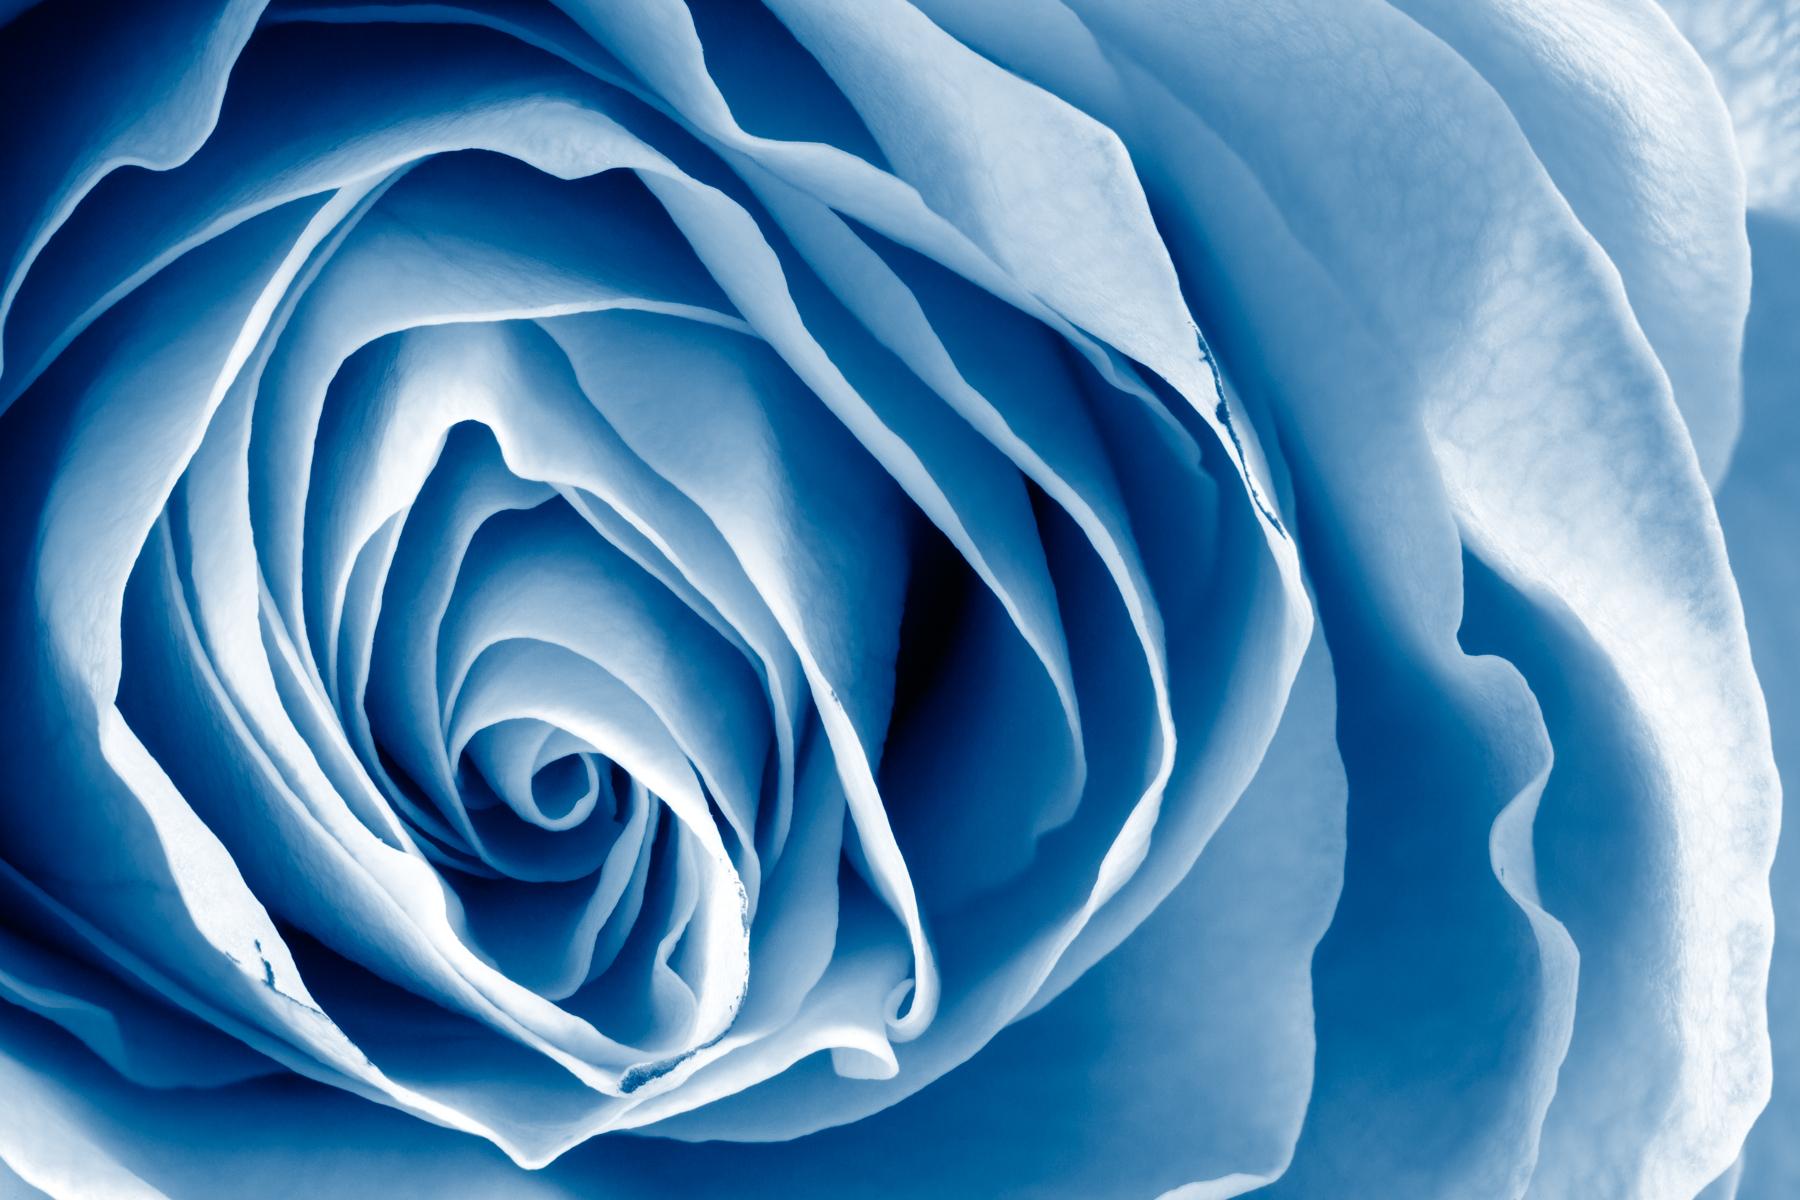 stockvault-blue-rose---hdr141310